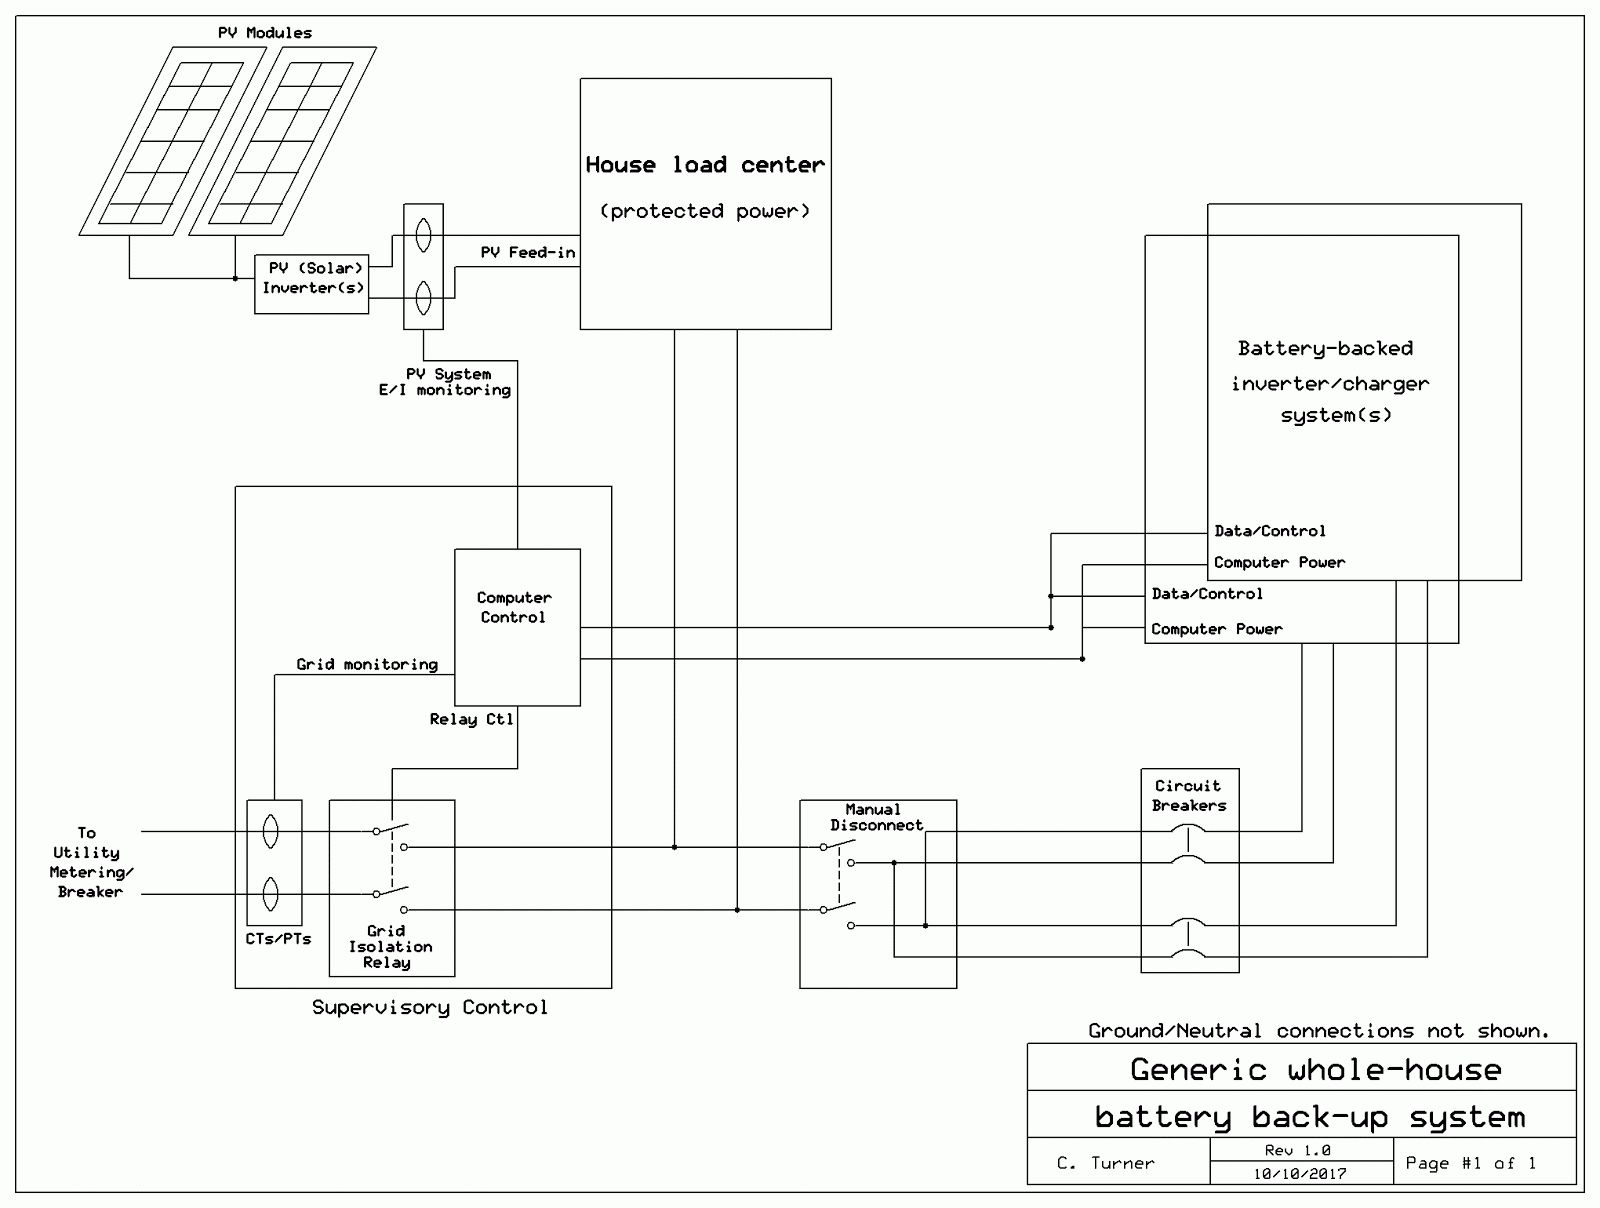 medium resolution of tesla battery diagram ka7oei s blog does the tesla powerwall 2 tesla model s battery diagram tesla battery diagram